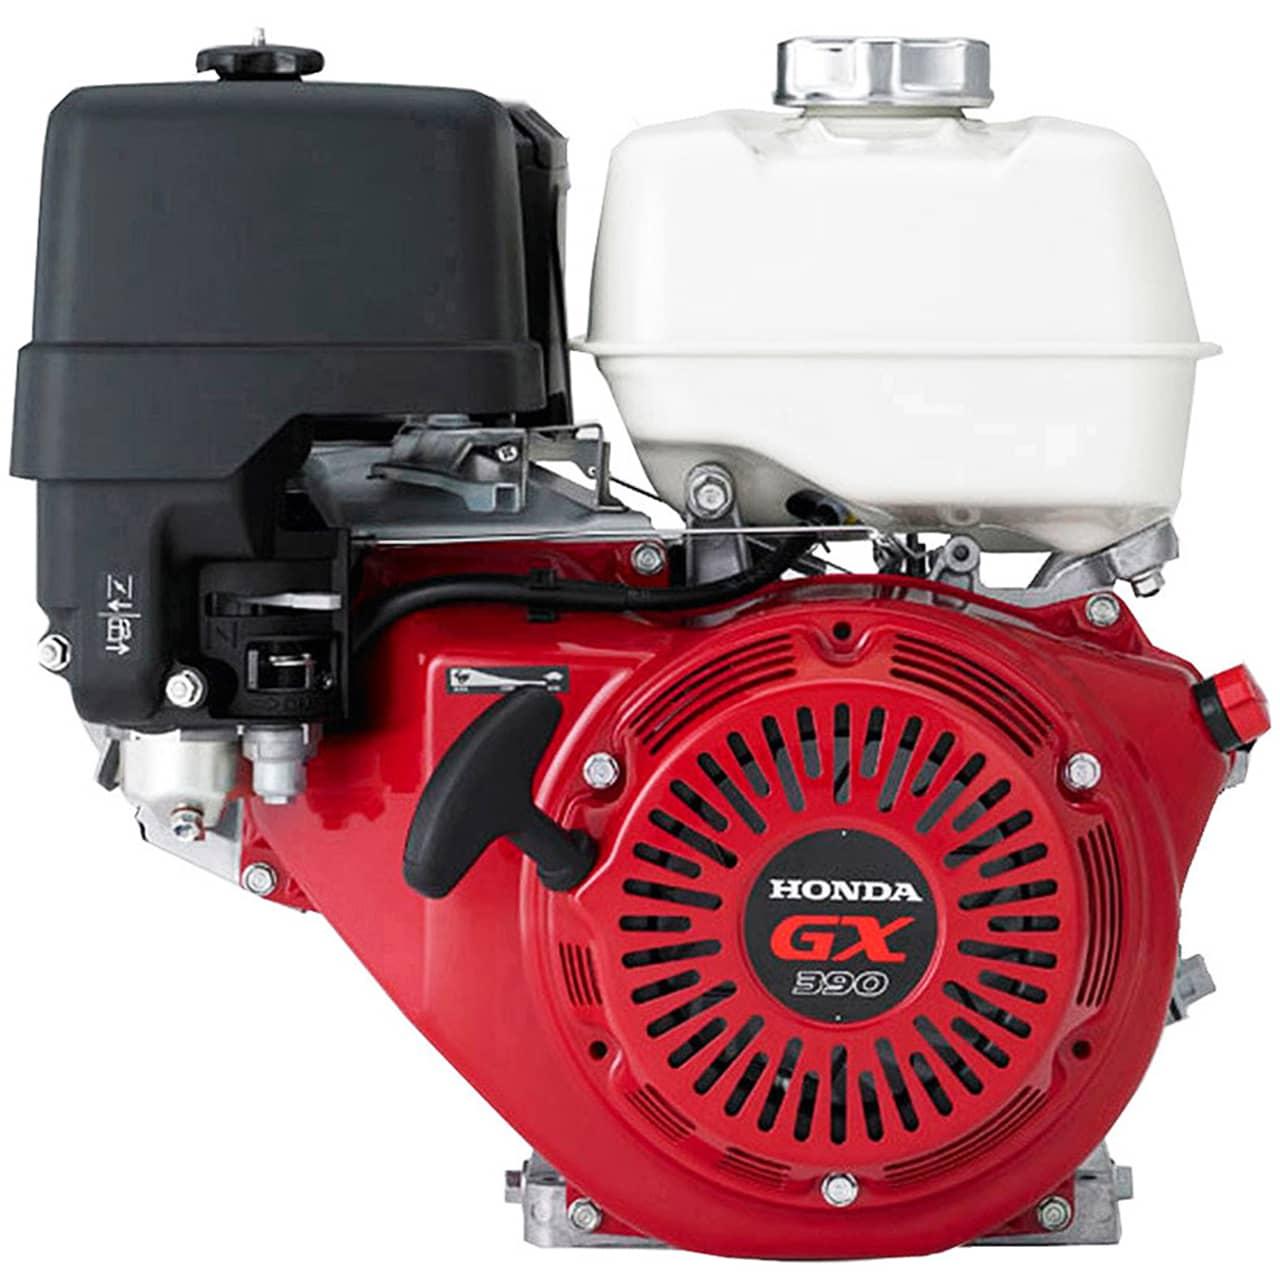 Motor Gasolina Honda GX 390 QDBR 389cc 13hp Com Alerta Óleo